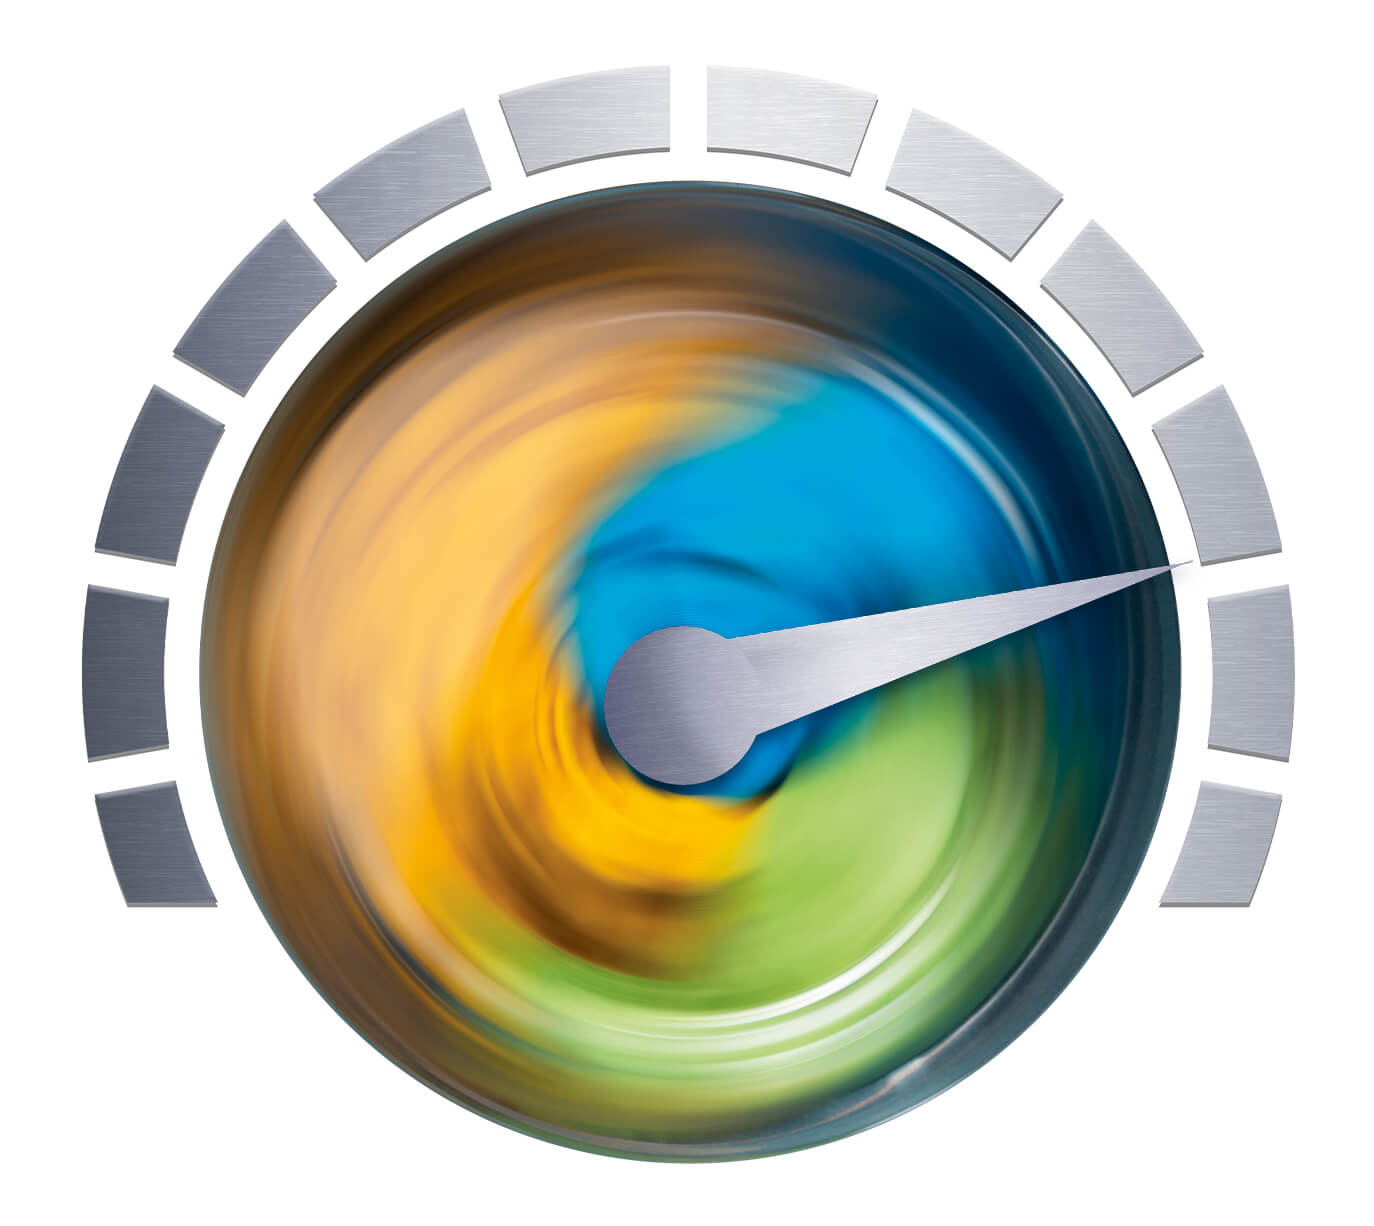 washing machine spin speed